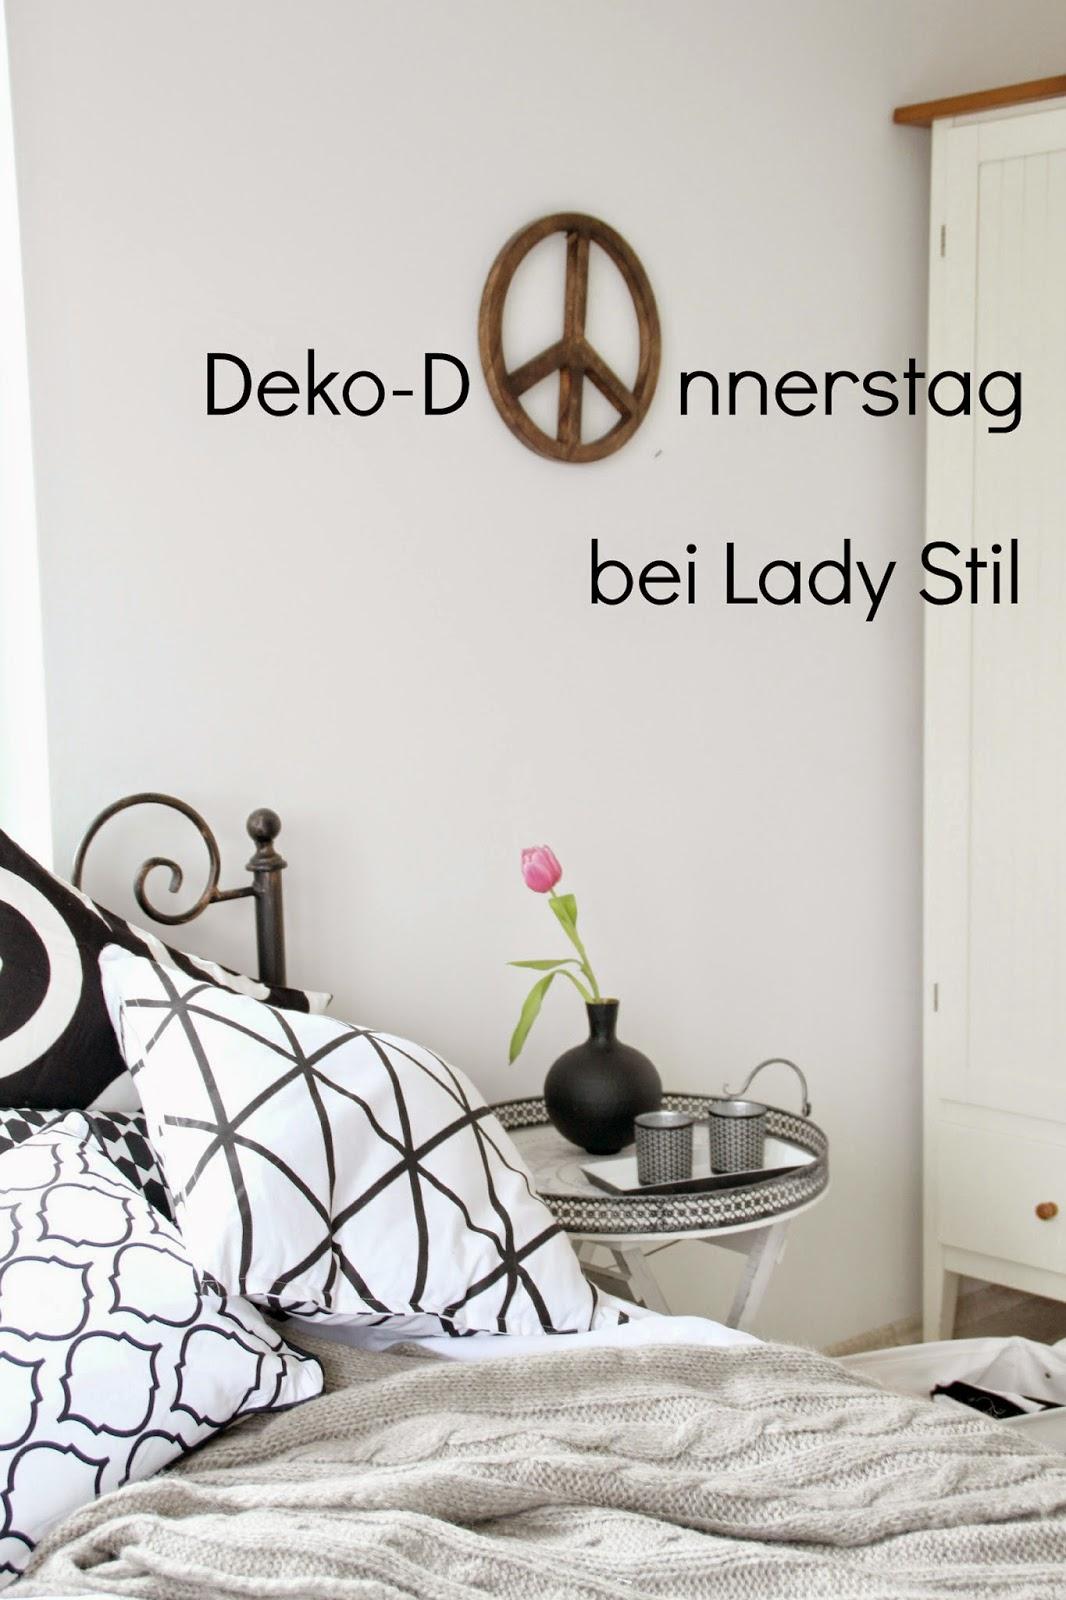 Dekodonnerstag by Ladystil